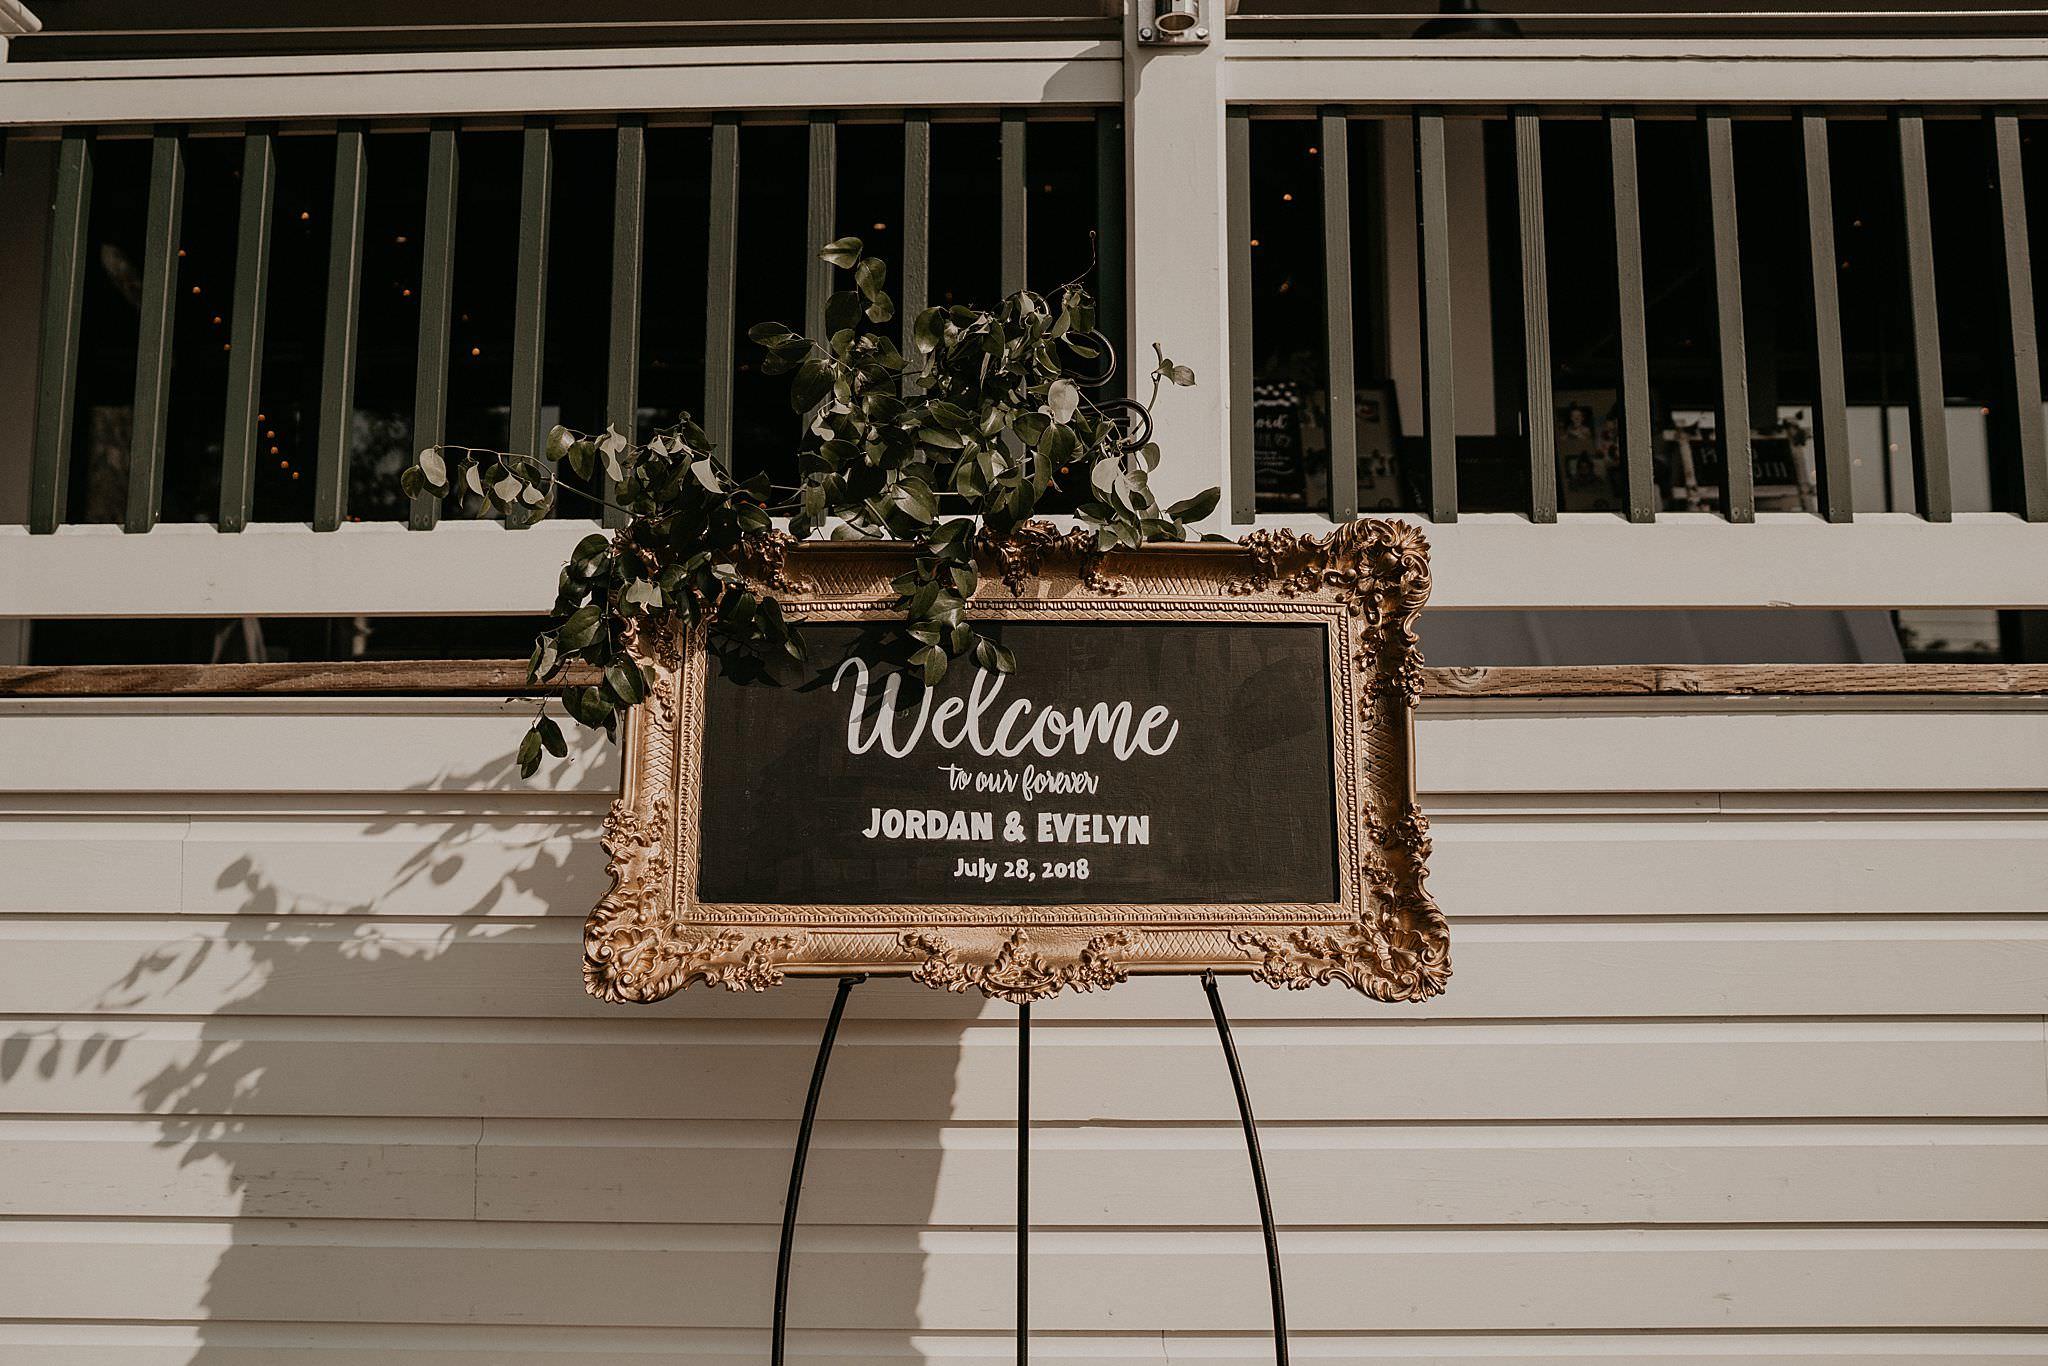 roche-harbor-wedding-san-juans-island-washington_0090.jpg